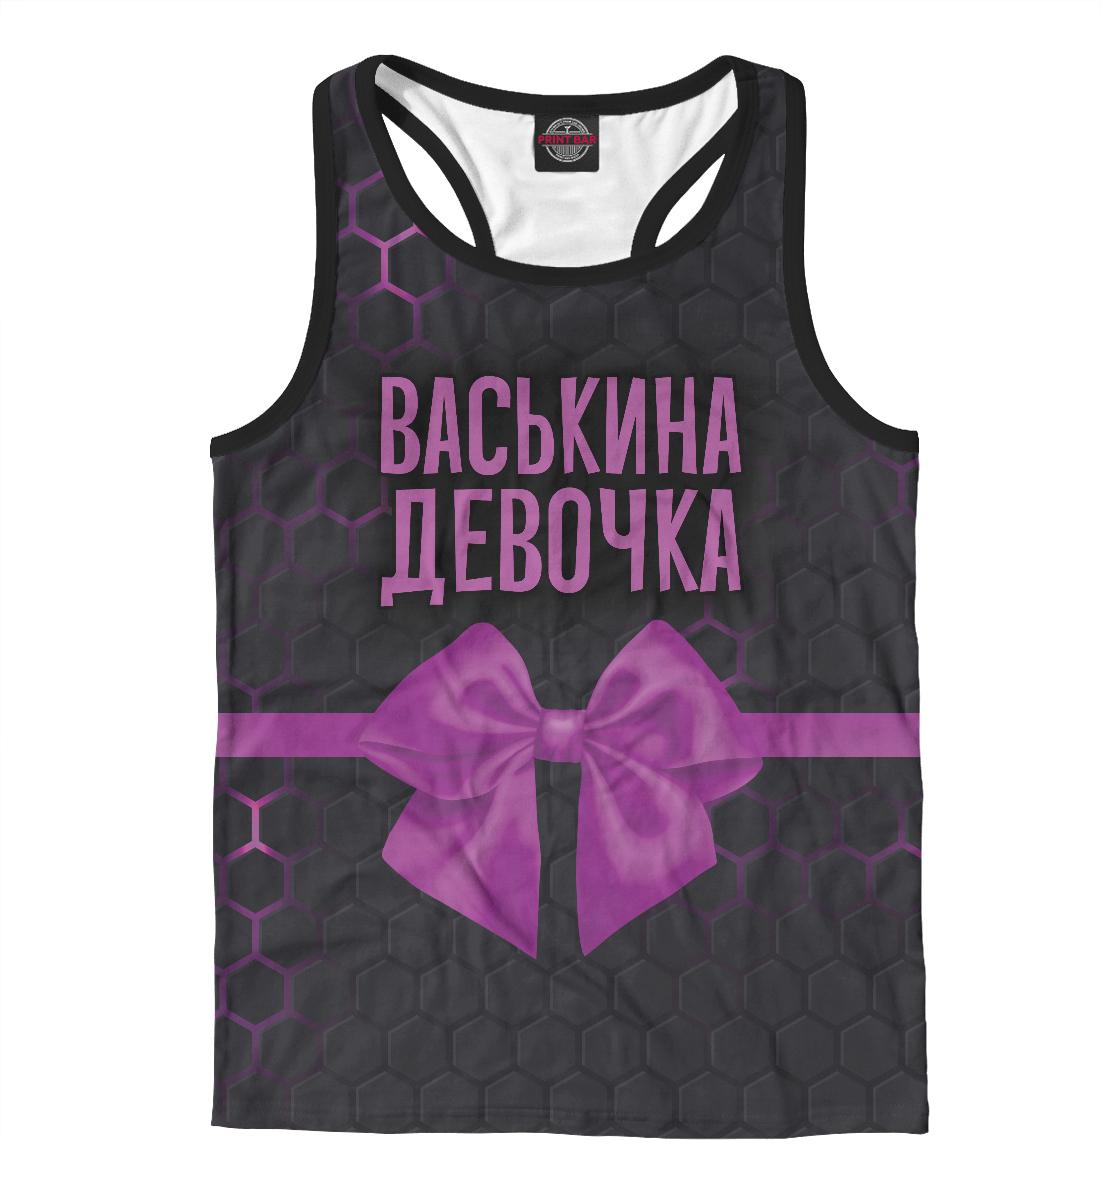 Майка борцовка Васькина девочка